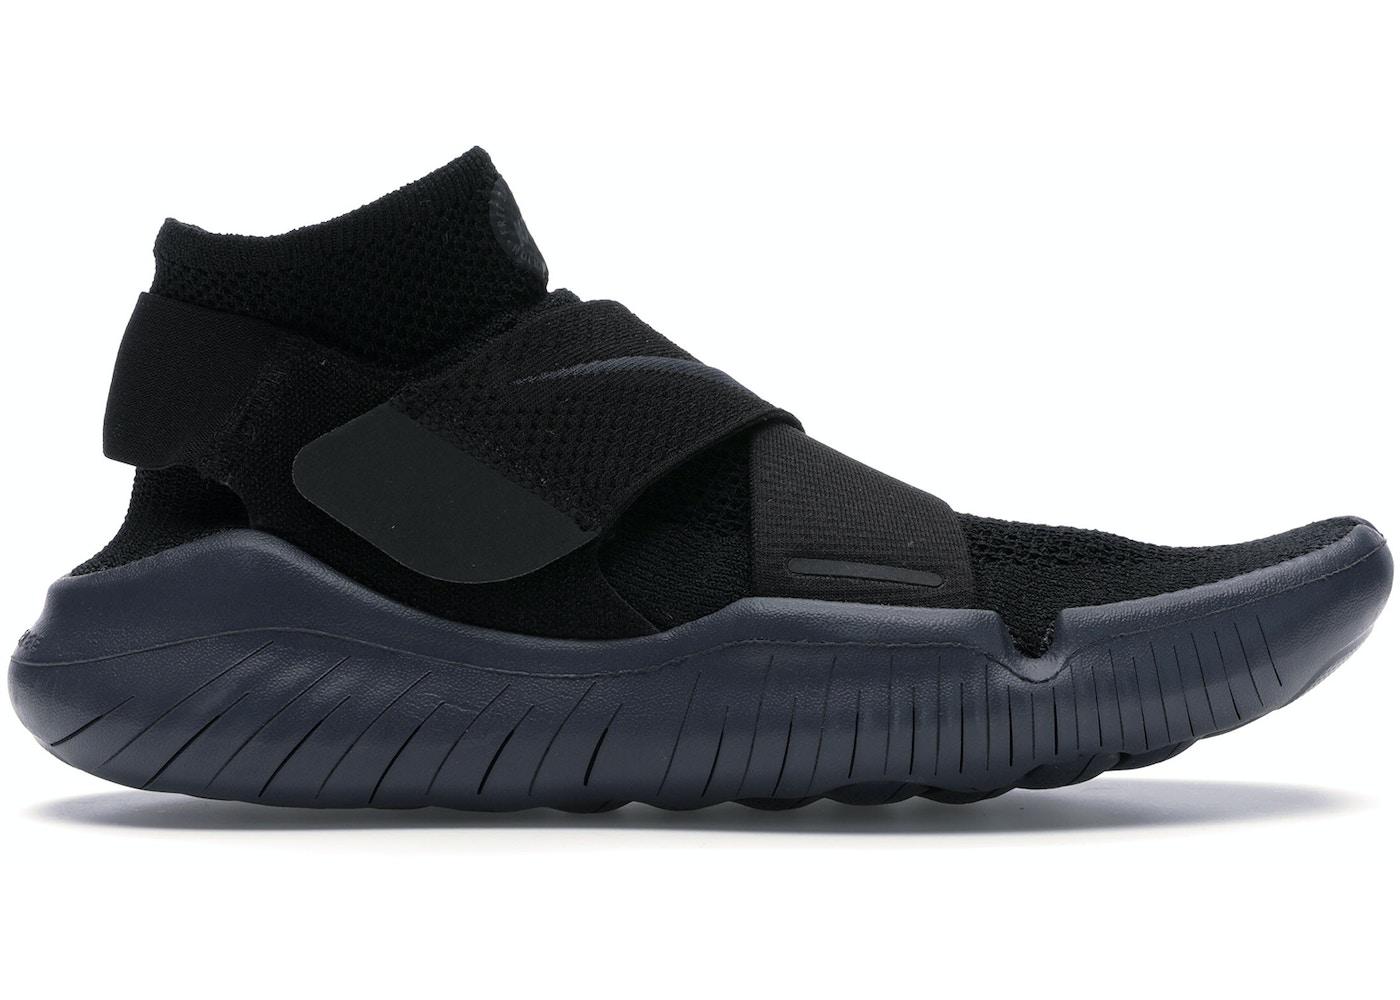 prefacio Piscina Condimento  Nike Free RN Motion Flyknit 2018 Black Anthracite - 942840-002